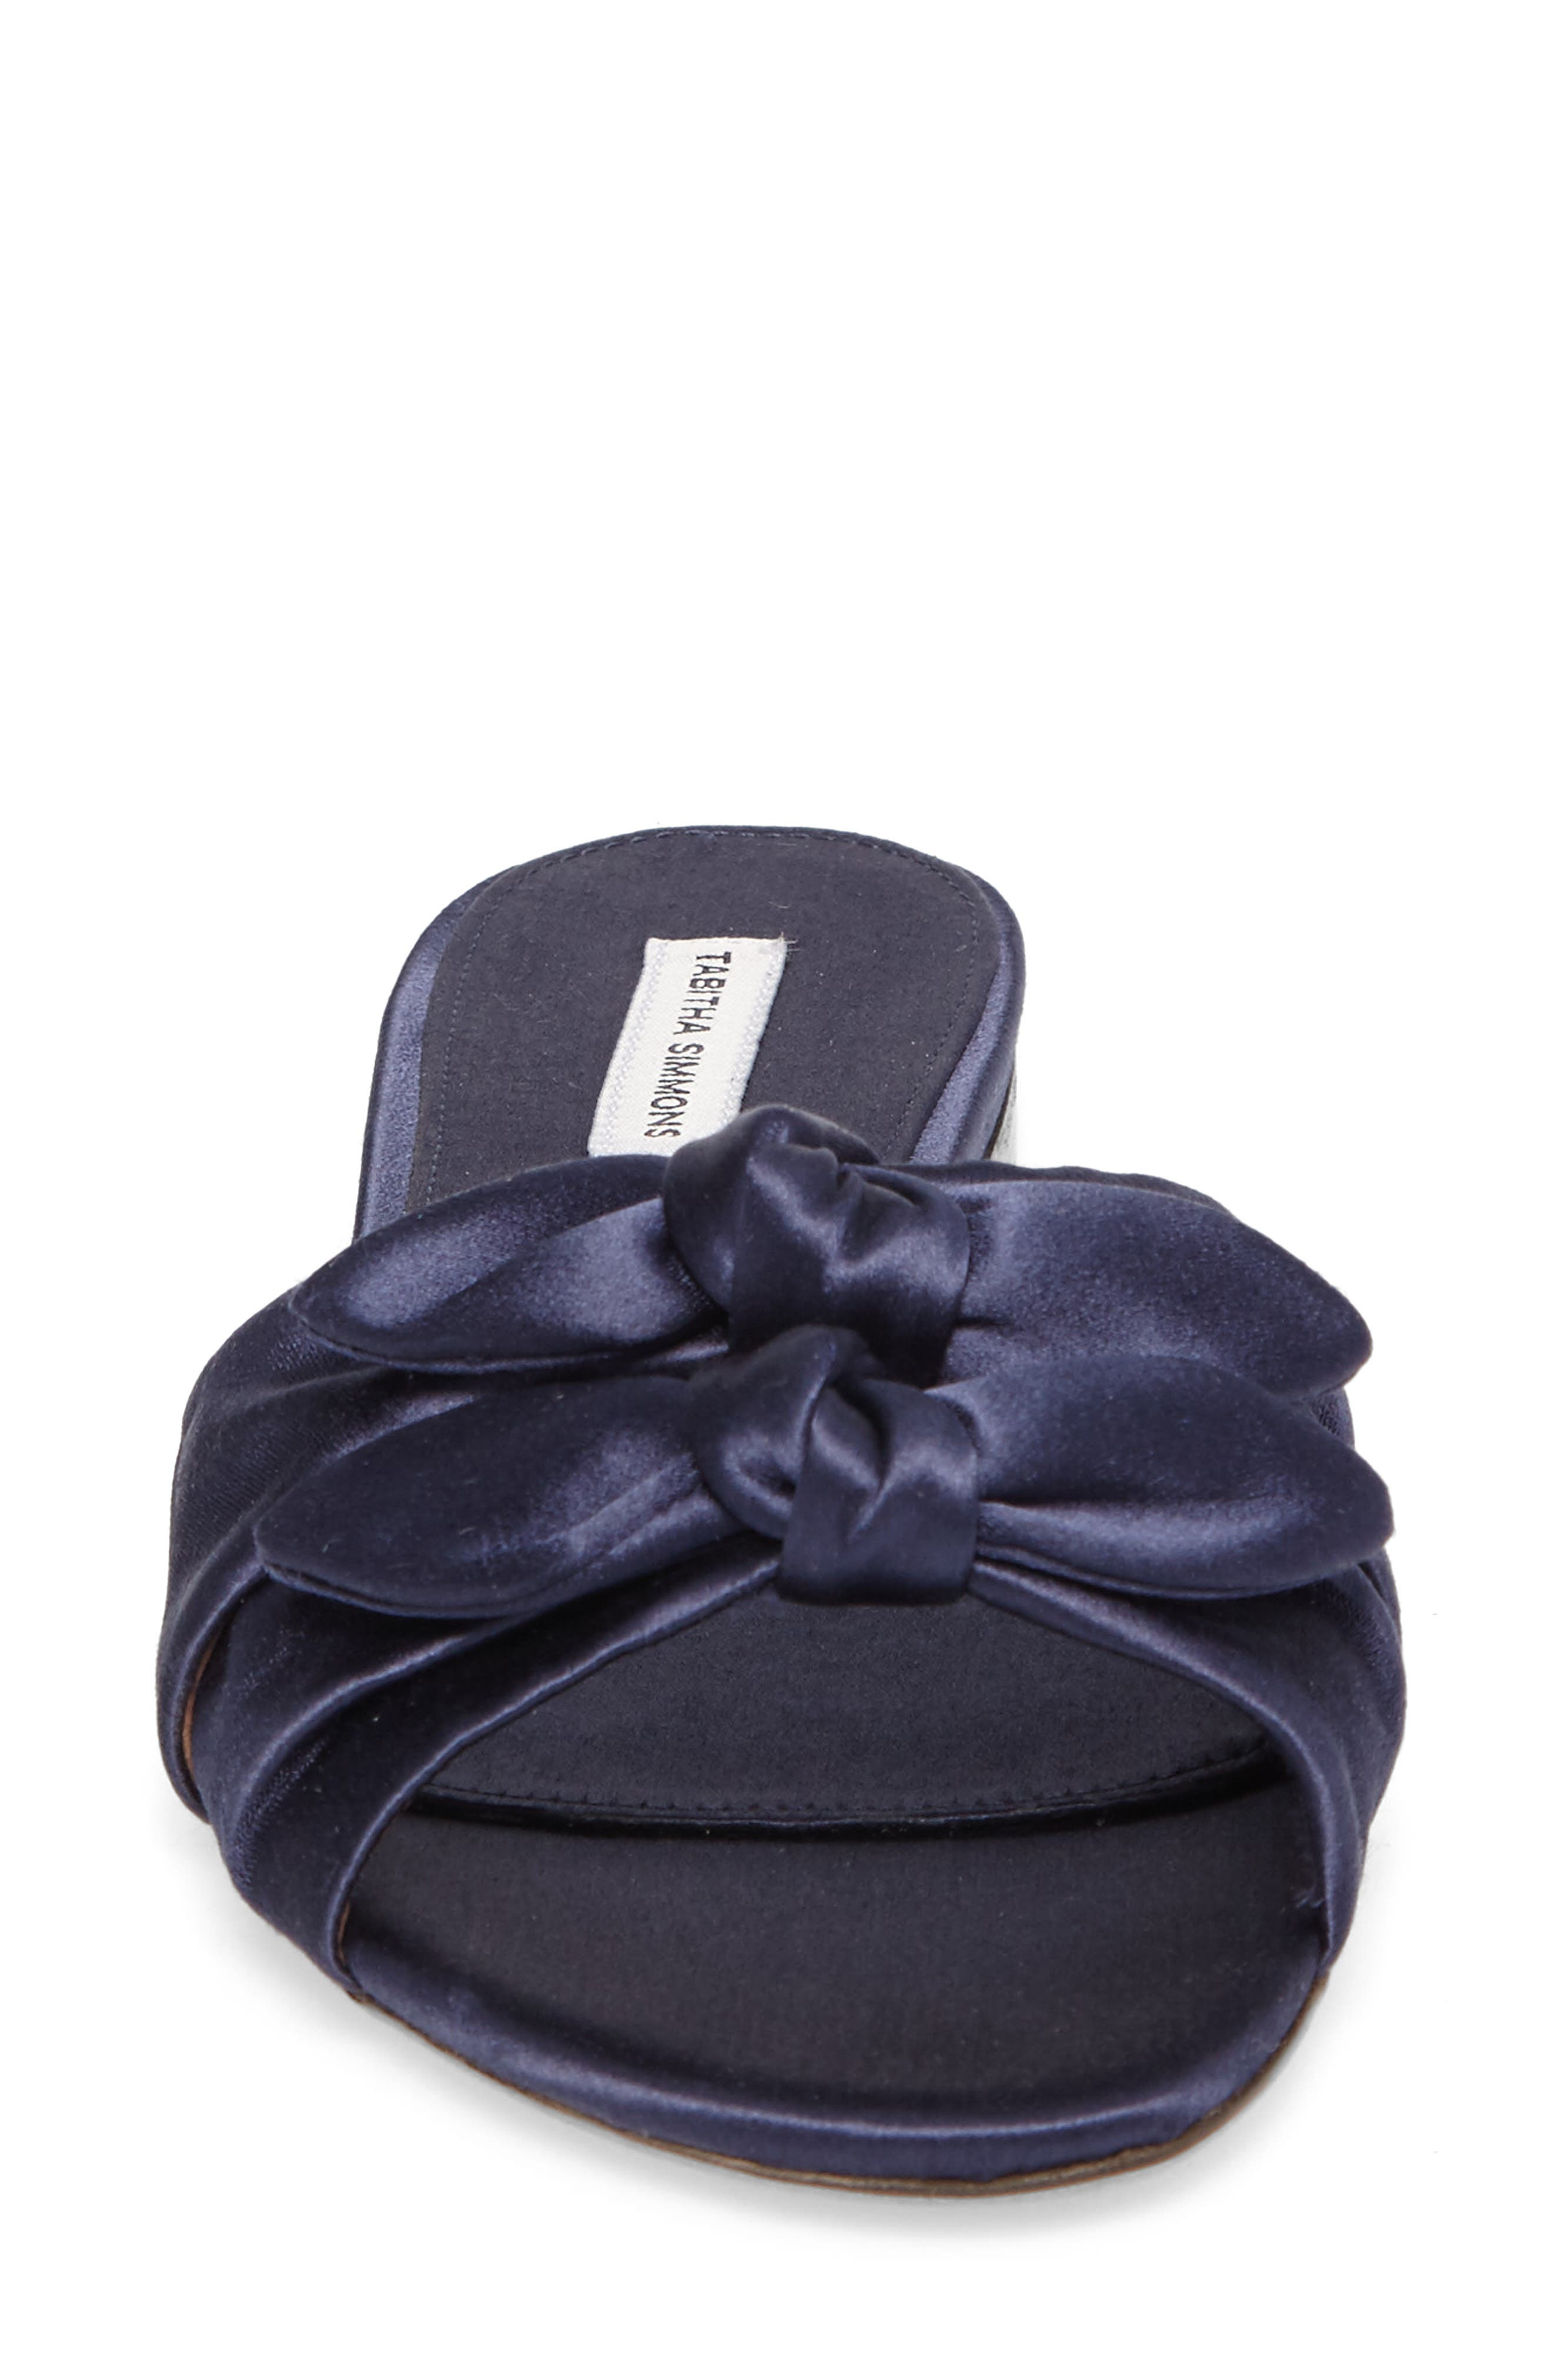 Cleo Knotted Bow Slide Sandal,                             Alternate thumbnail 4, color,                             Navy